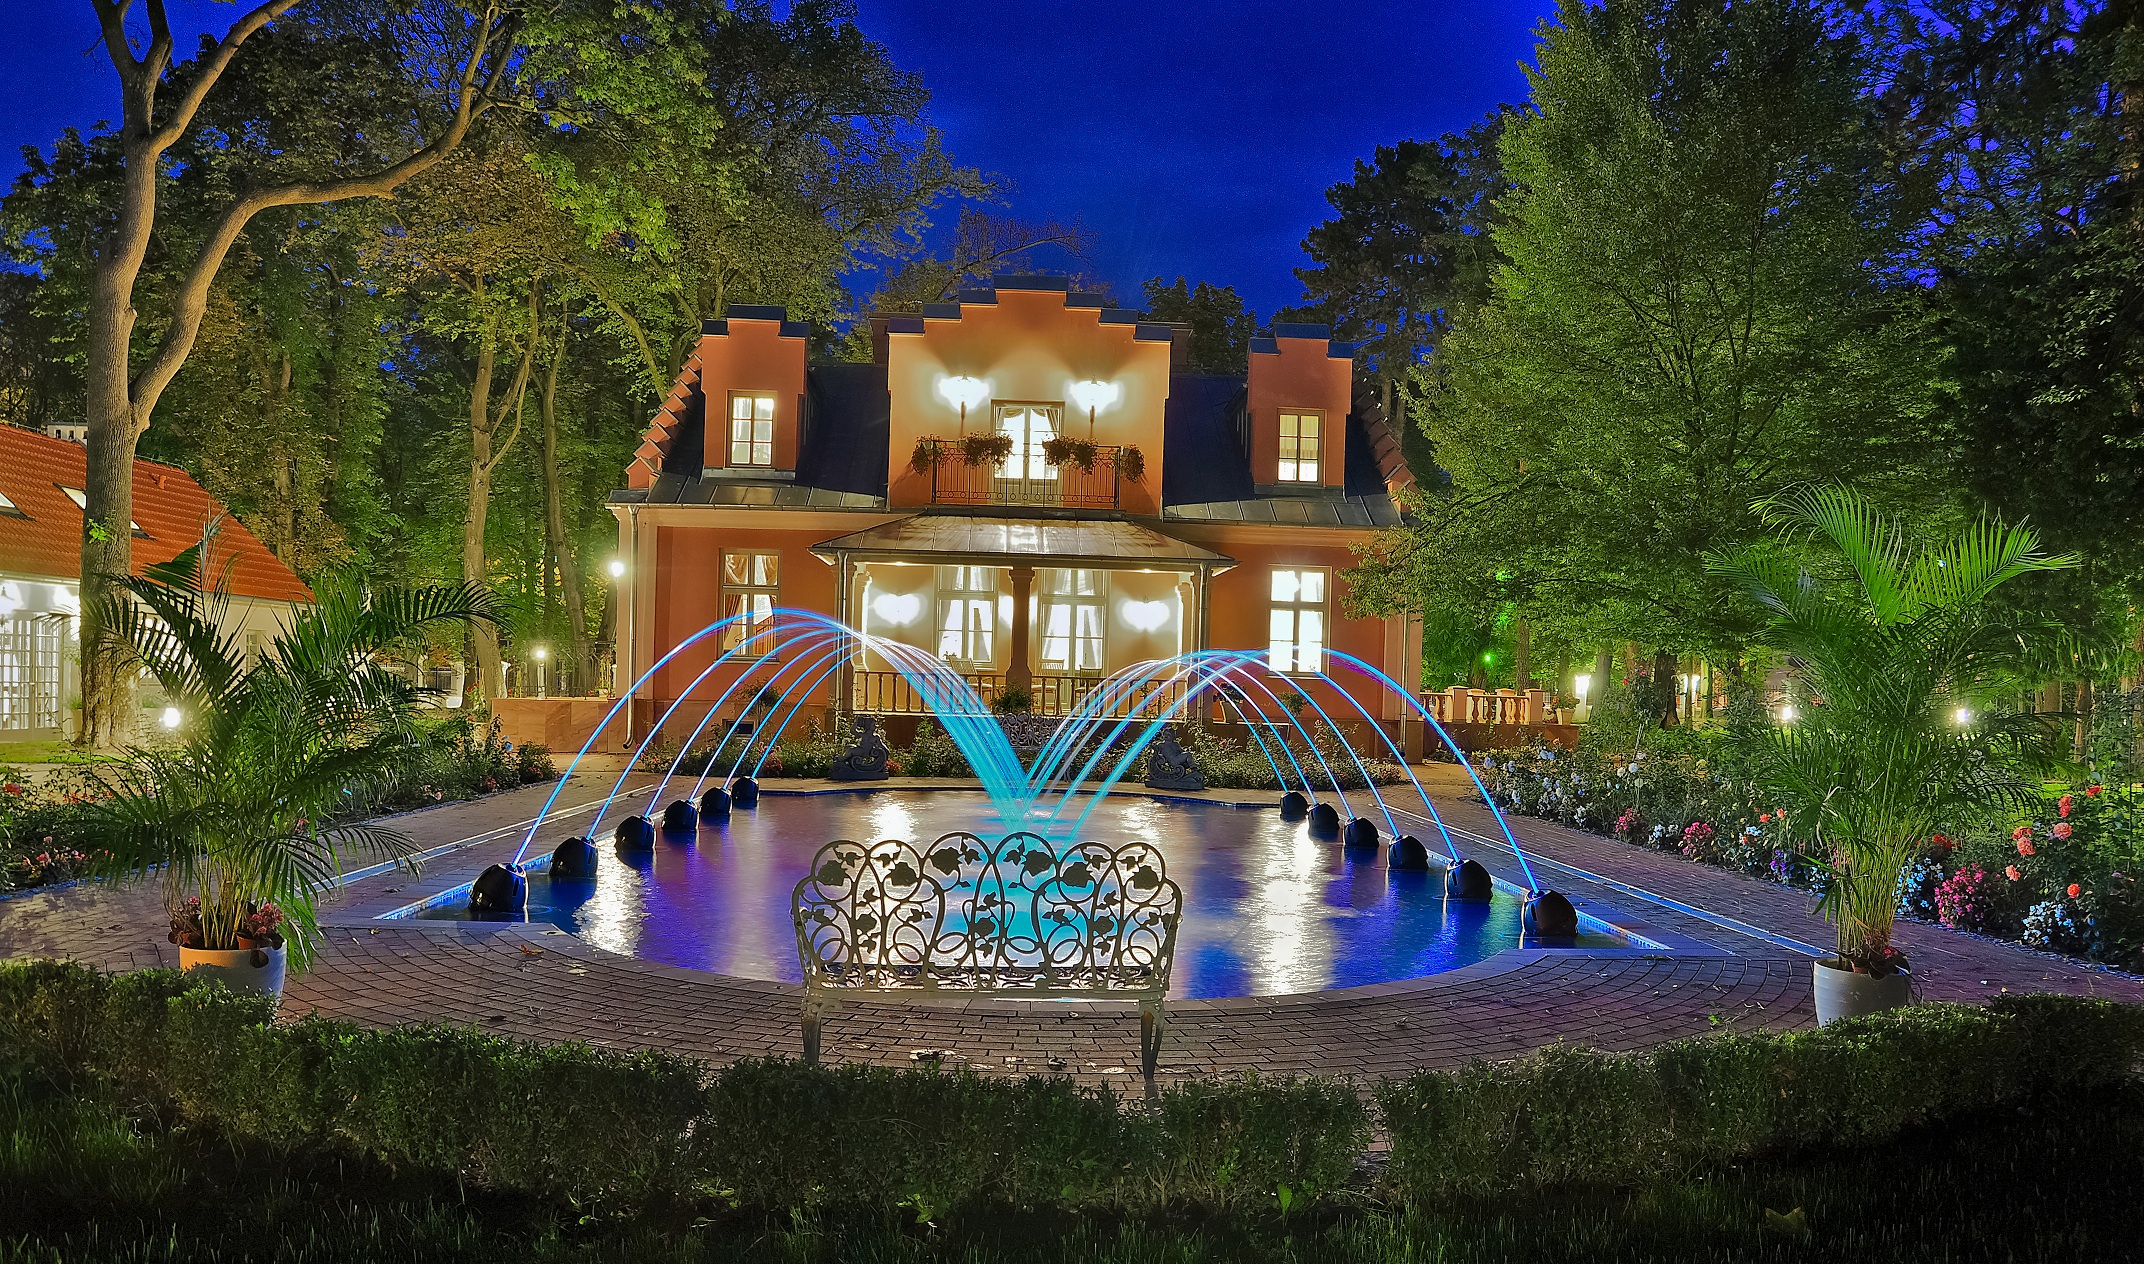 Willa Rozana - Ormonde Resort